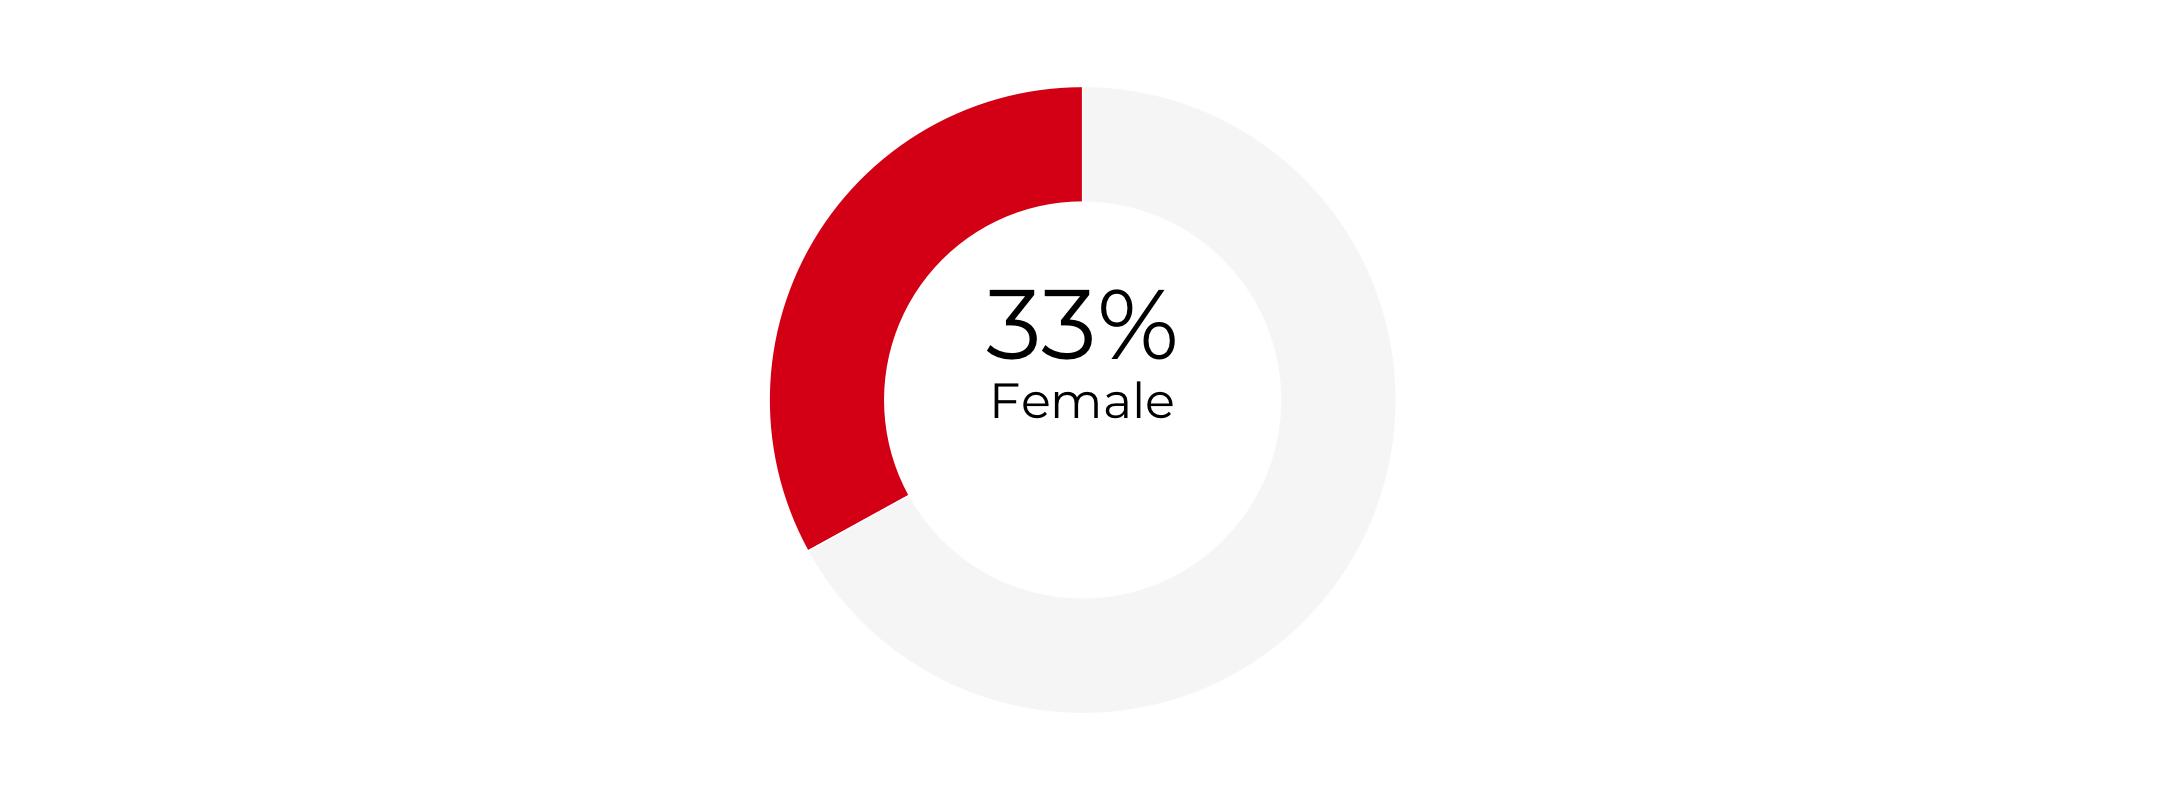 Graph about Gender Composition of Secretaries of Homeland Security. More detailed text description below.